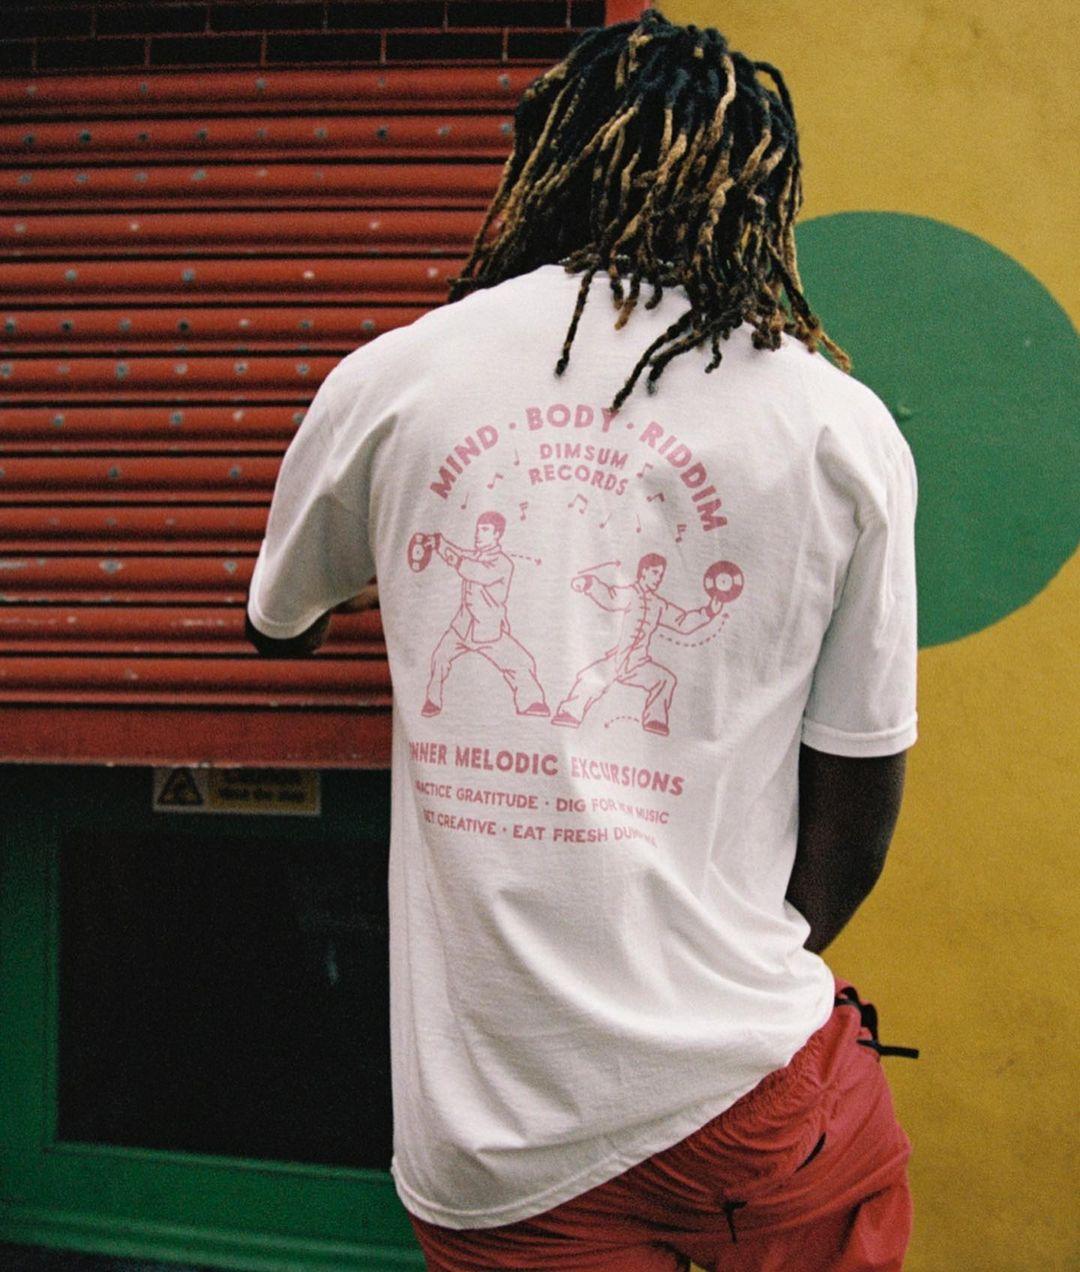 Everpress-creator-toolkit-How-Dim-Sum-Lennox-Kwan-nailed-close-to-20-T-shirt-drops